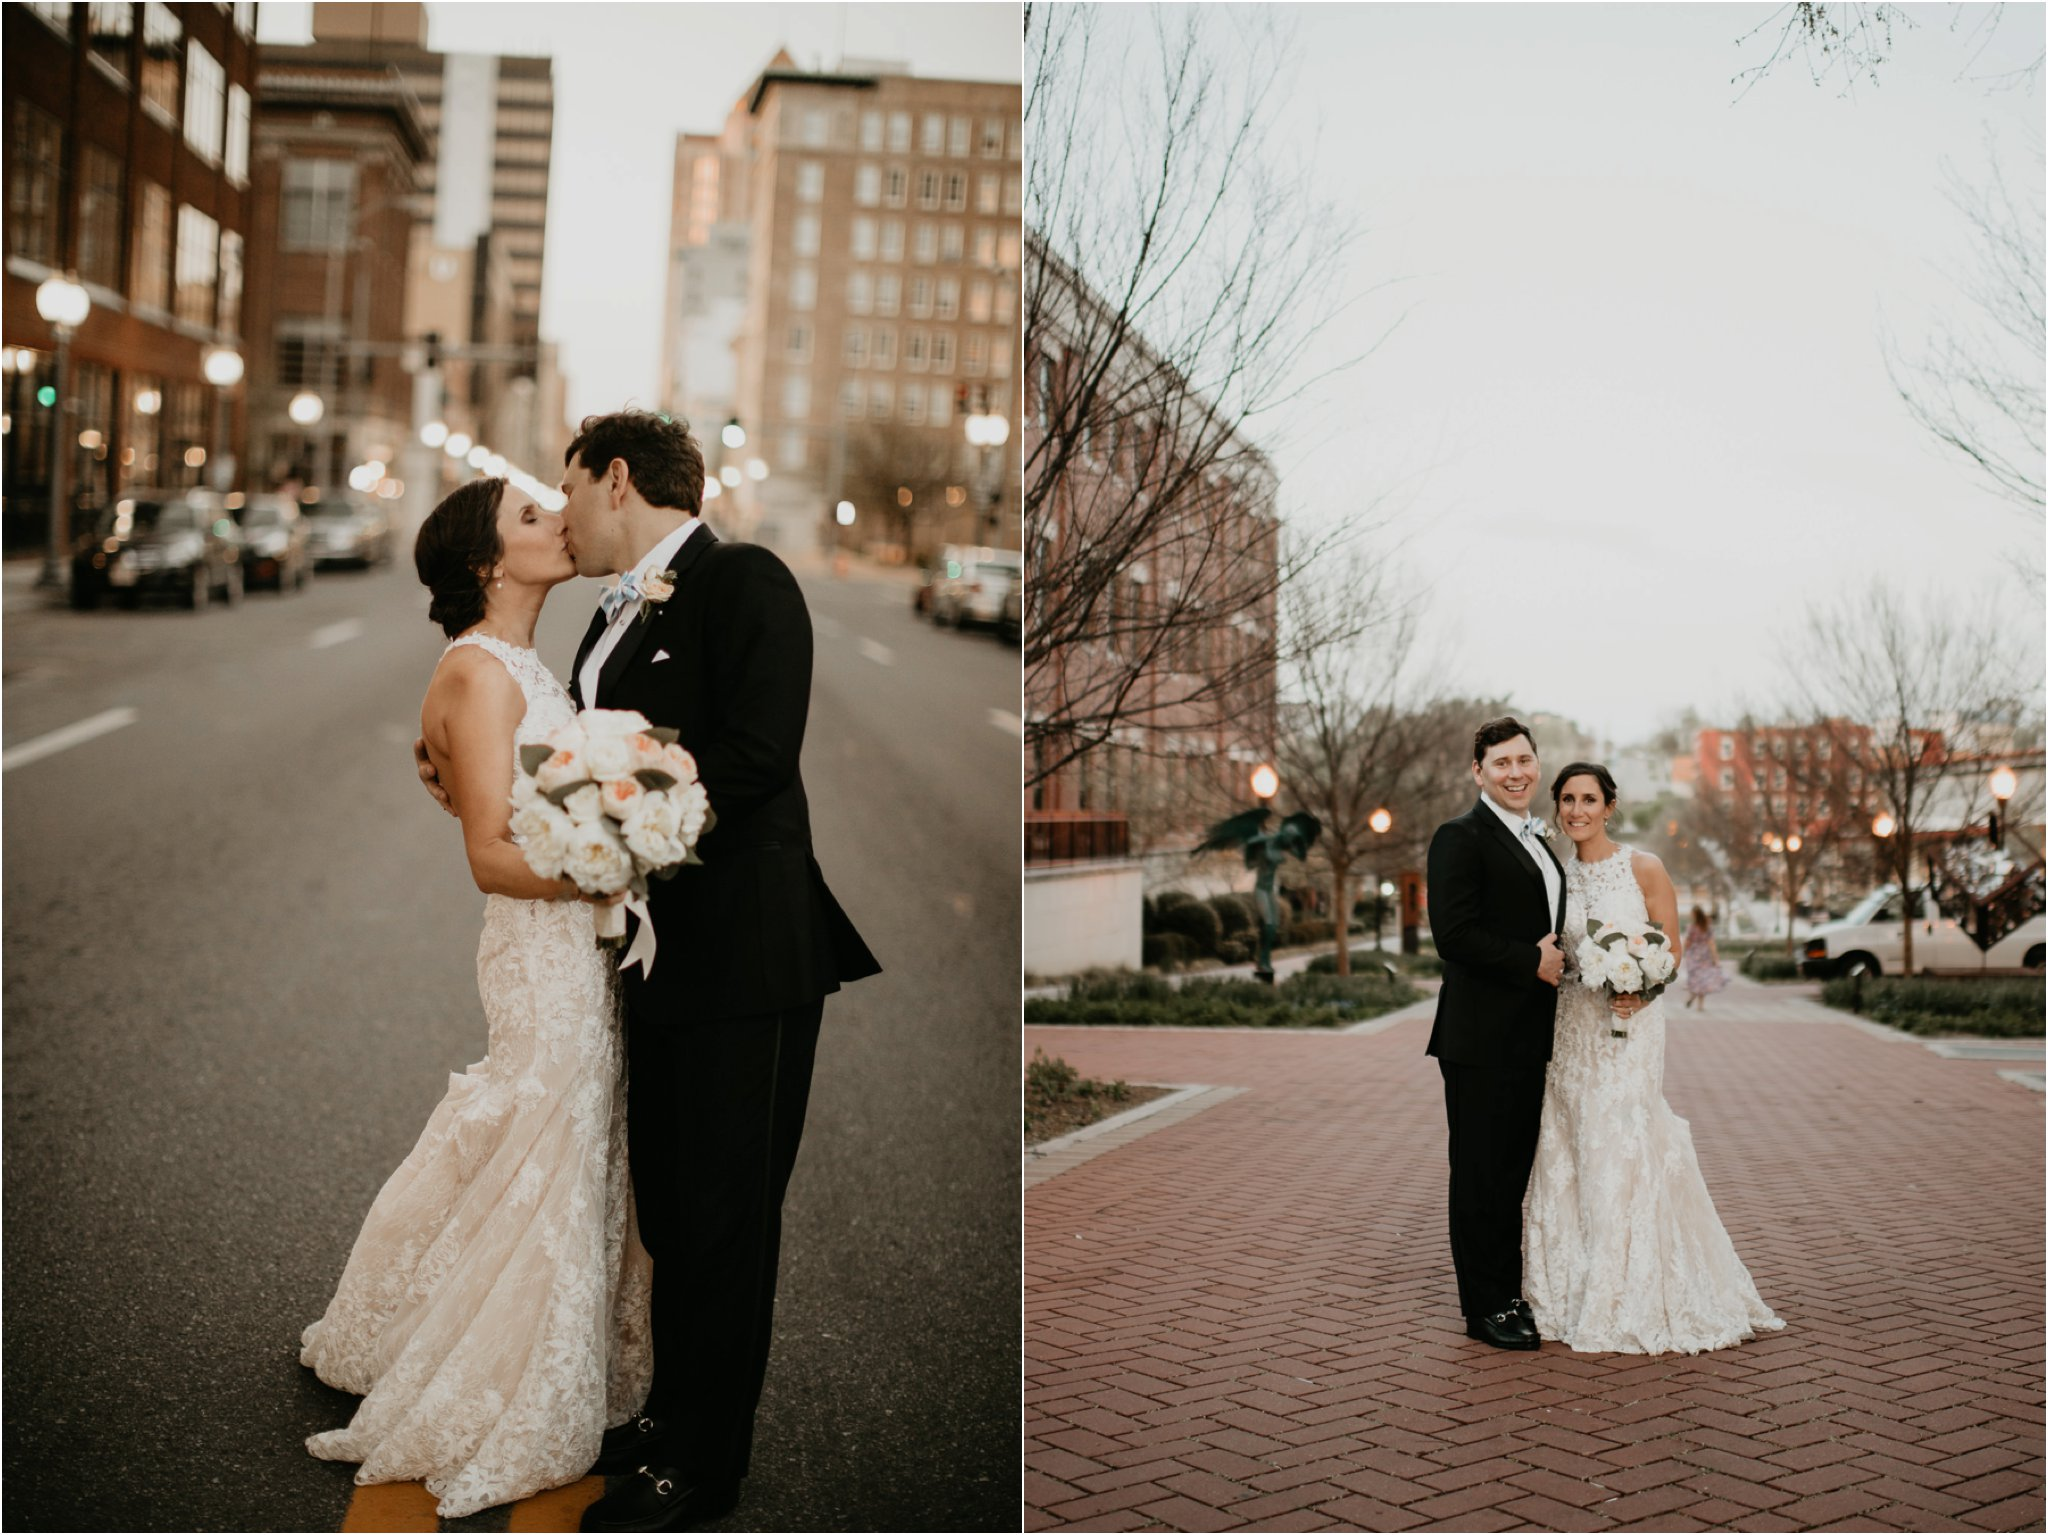 Patrick Henry Ballroom - Weddings - Virginia Wedding Photographer - Pat Cori Photography-110.jpg